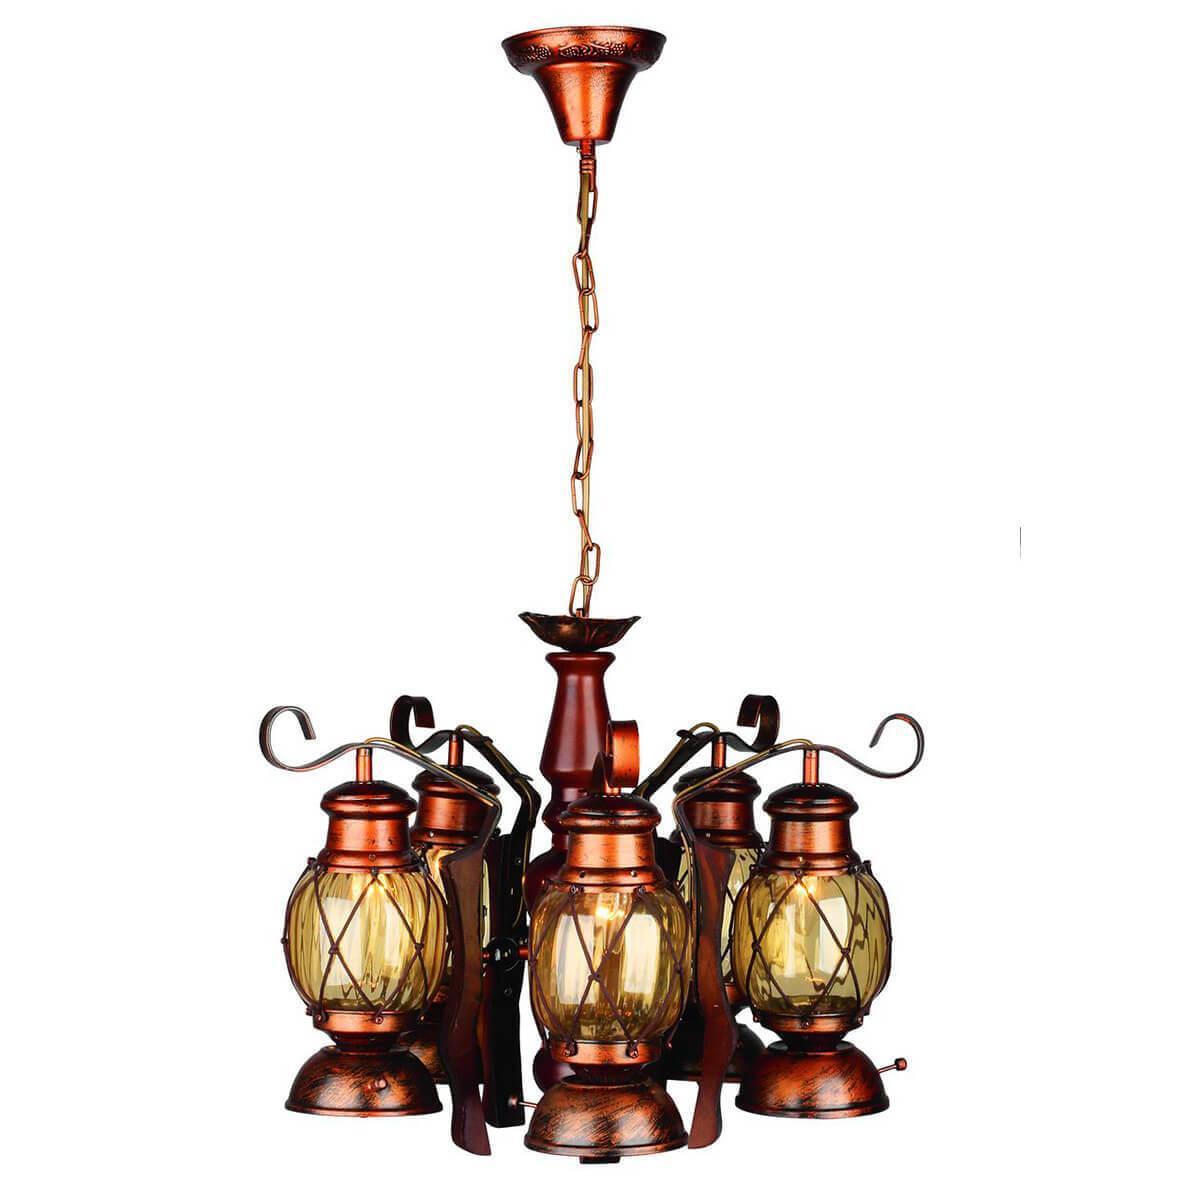 Подвесной светильник Omnilux OML-58303-05, E27, 40 Вт